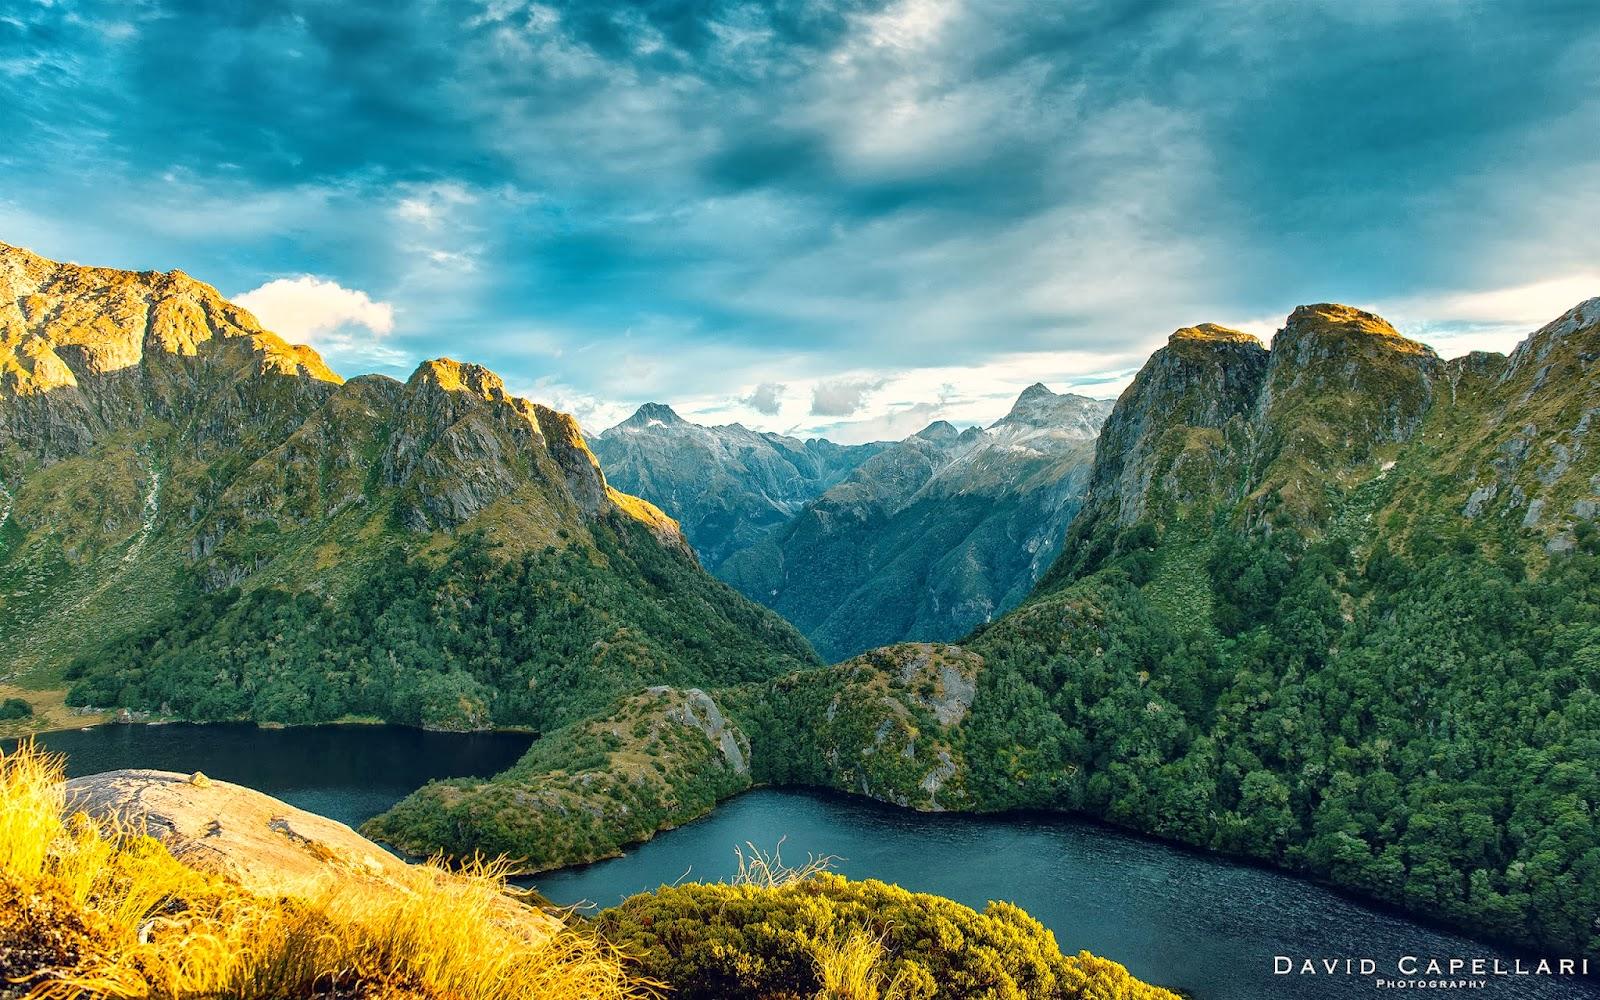 Beautiful landscape scenery wallpaper full hd wide for Beautiful landscapes